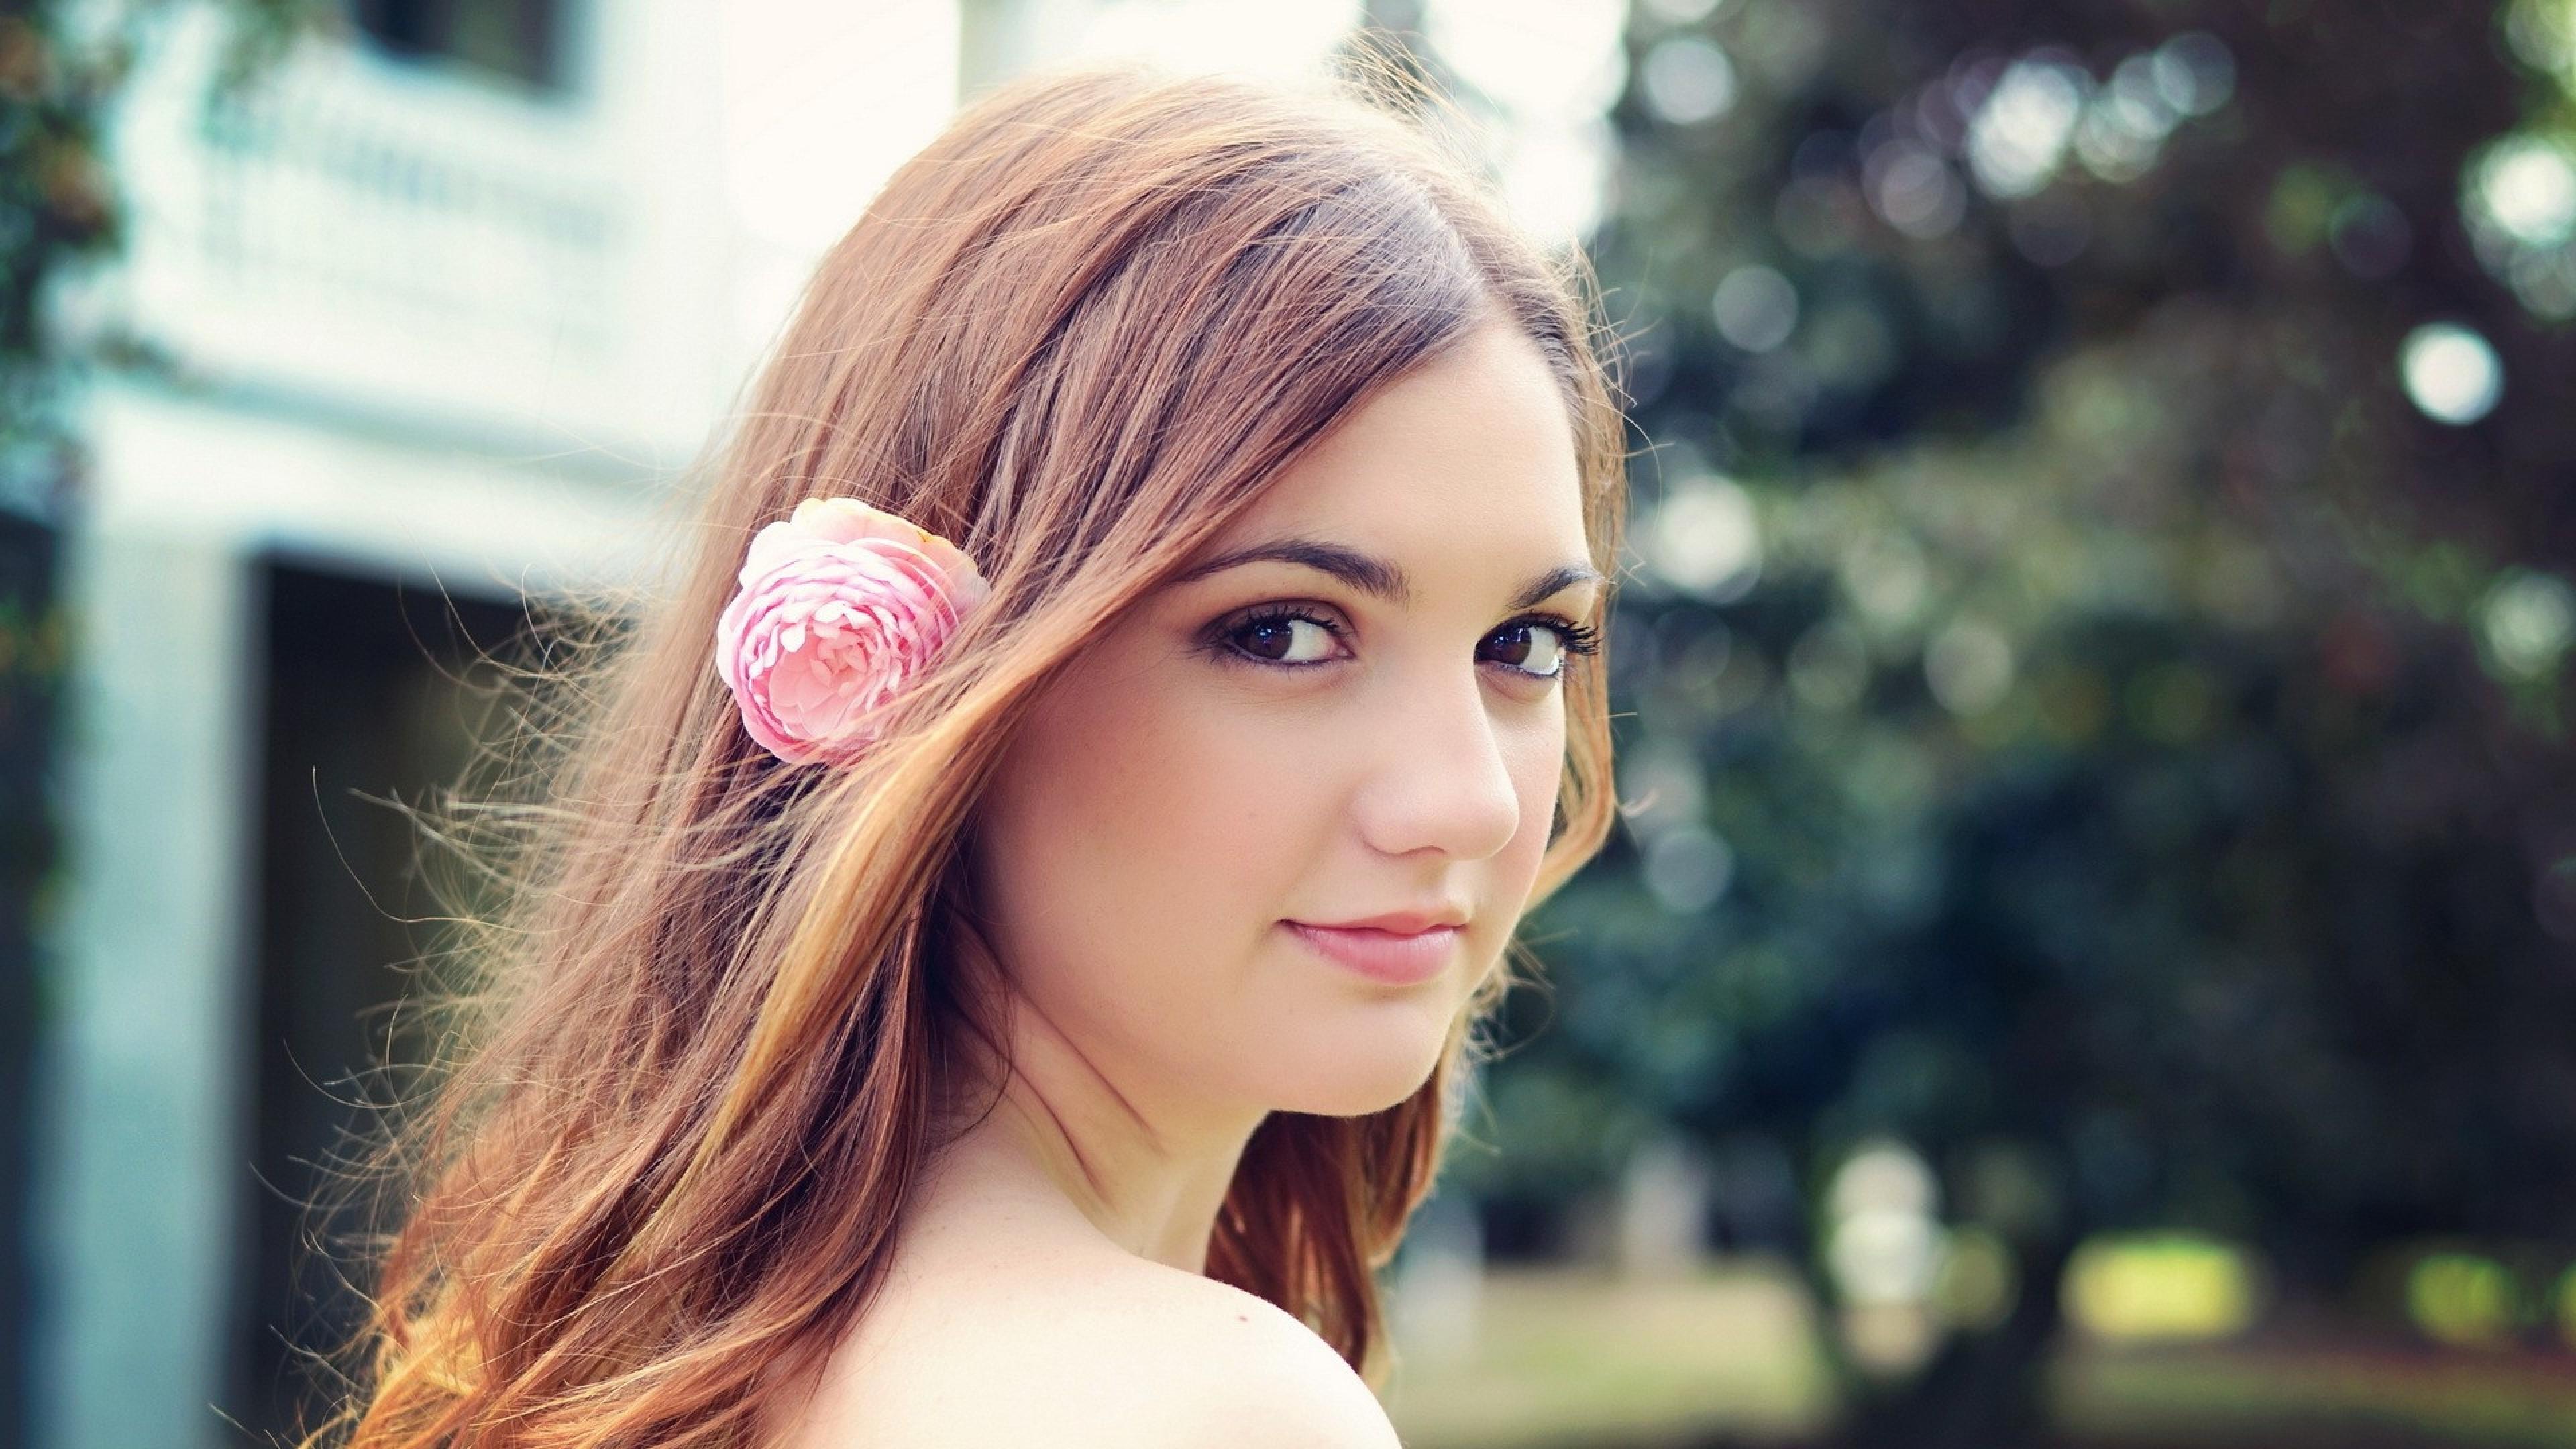 Brunette Girl Smiling, HD Girls, 4k Wallpapers, Images